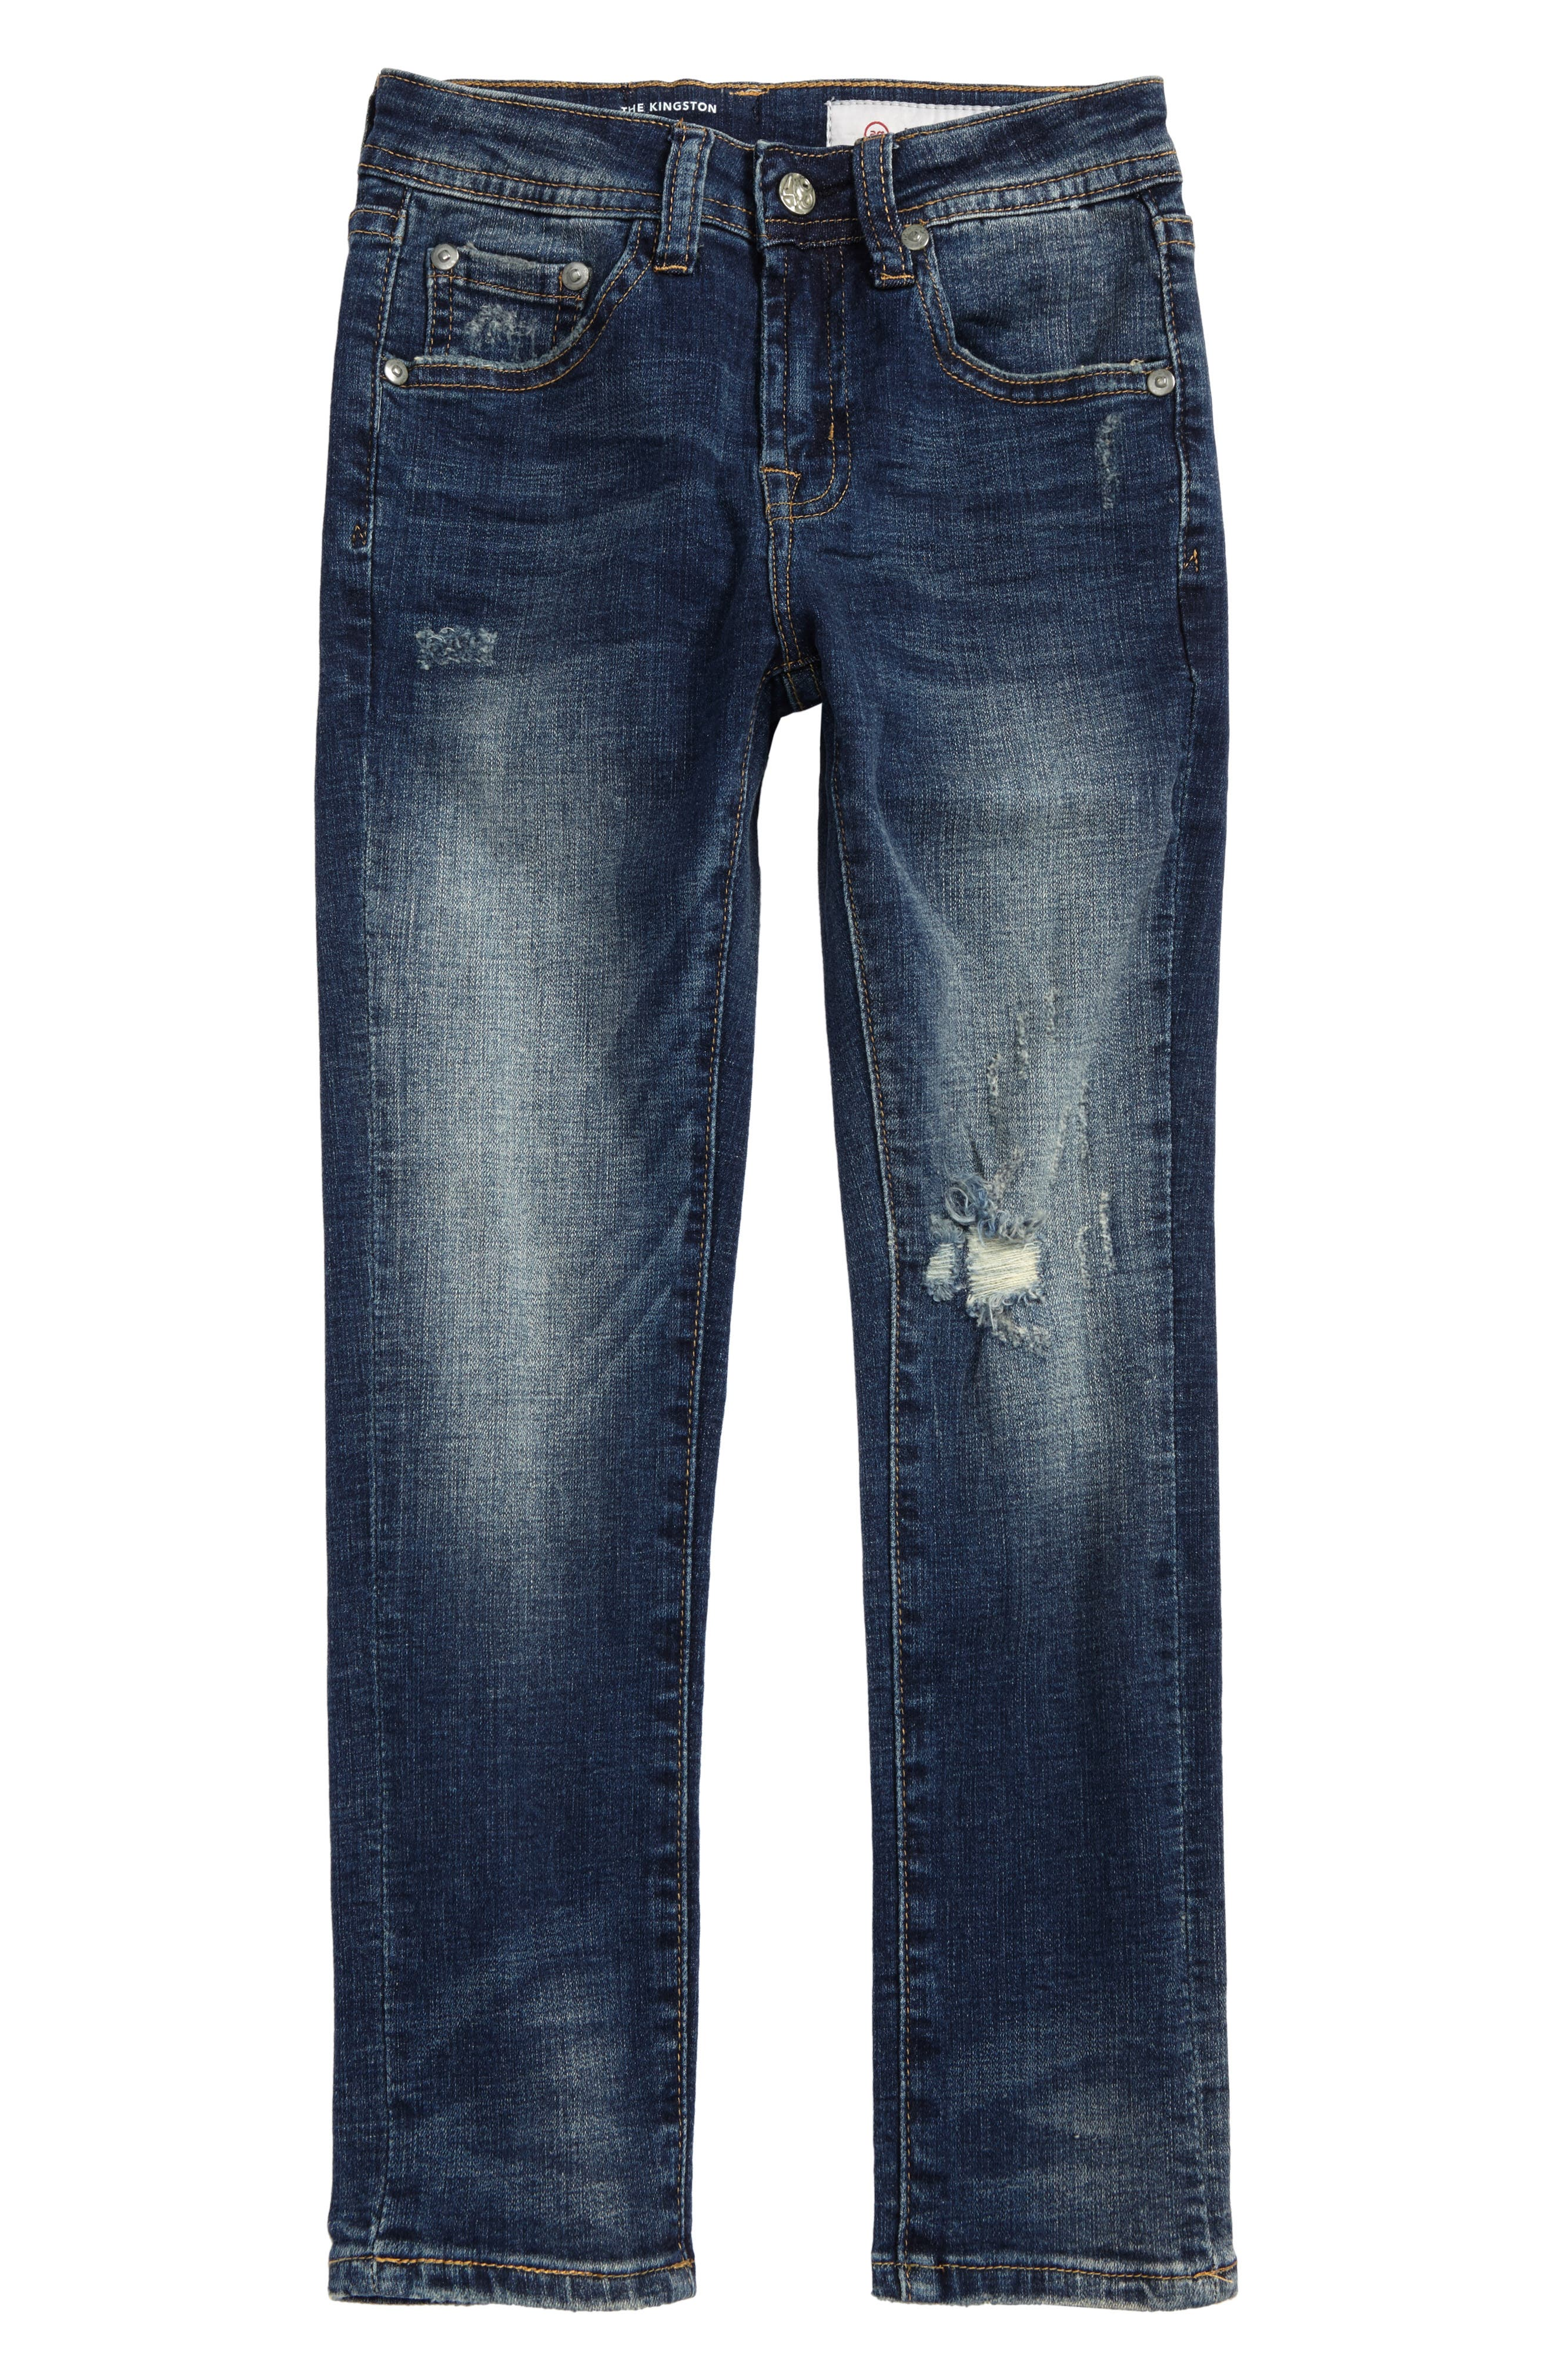 ag adriano goldschmied kids The Kingston Slim Skinny Jeans (Toddler Boys & Little Boys)